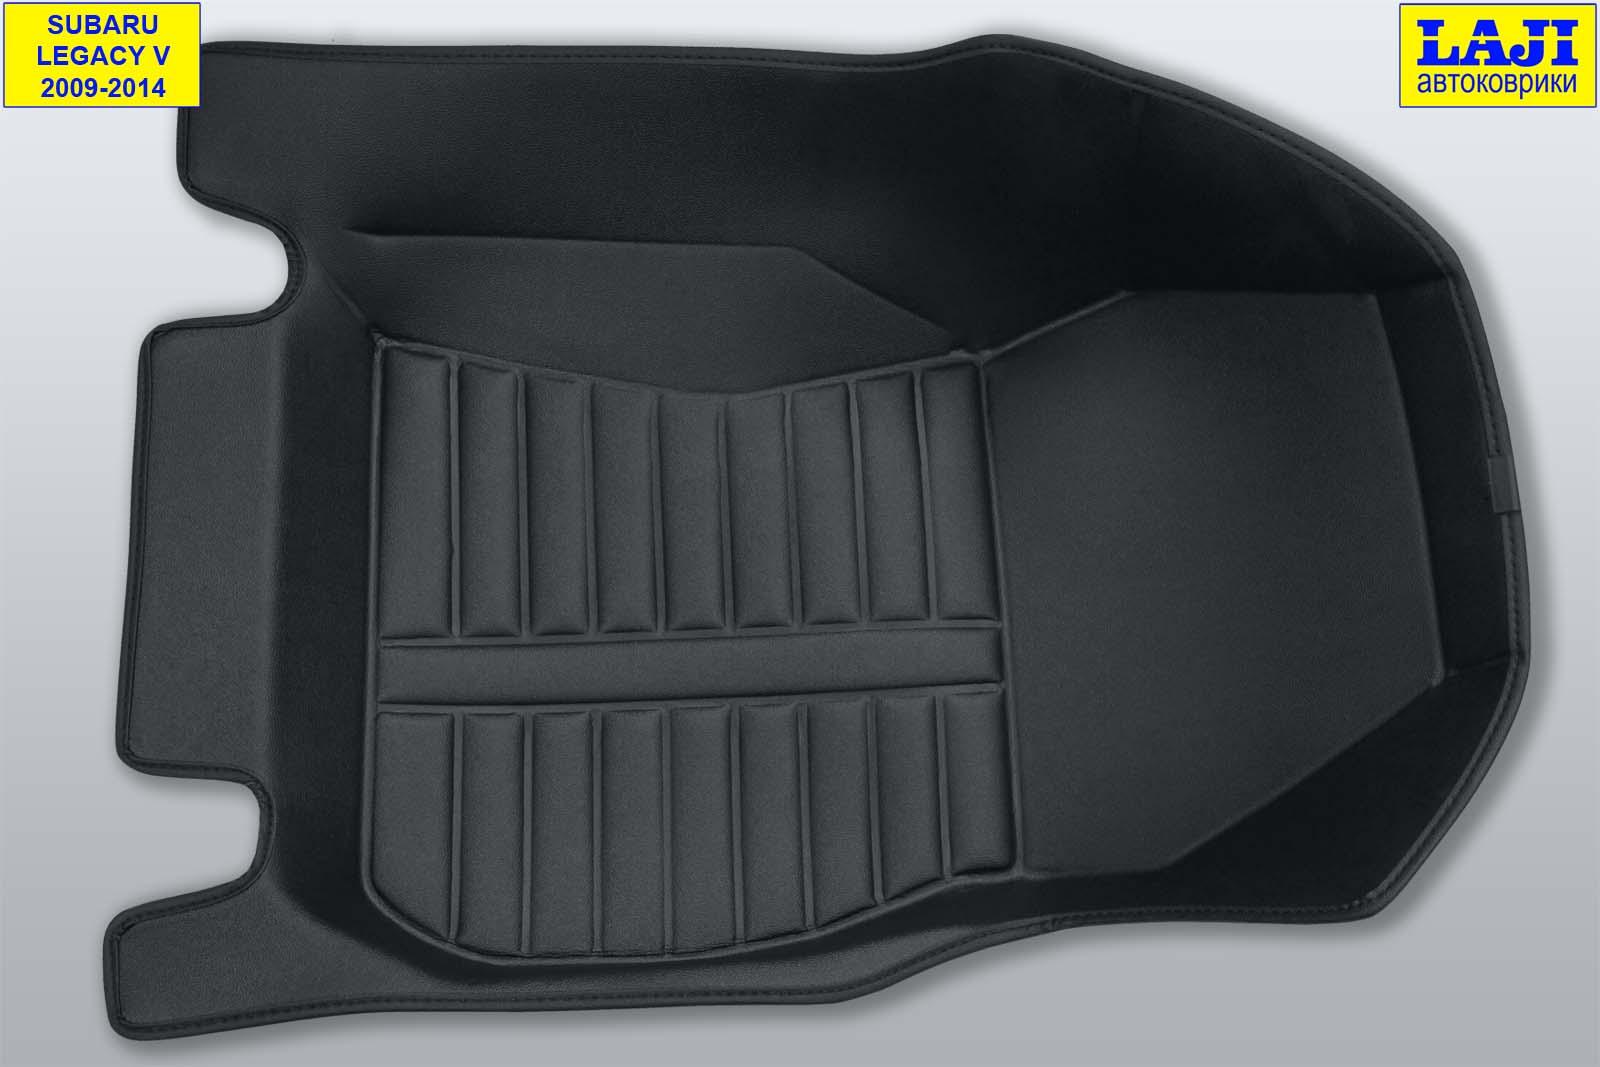 5D коврики в салон Subaru Legacy 5 2009-2014 4